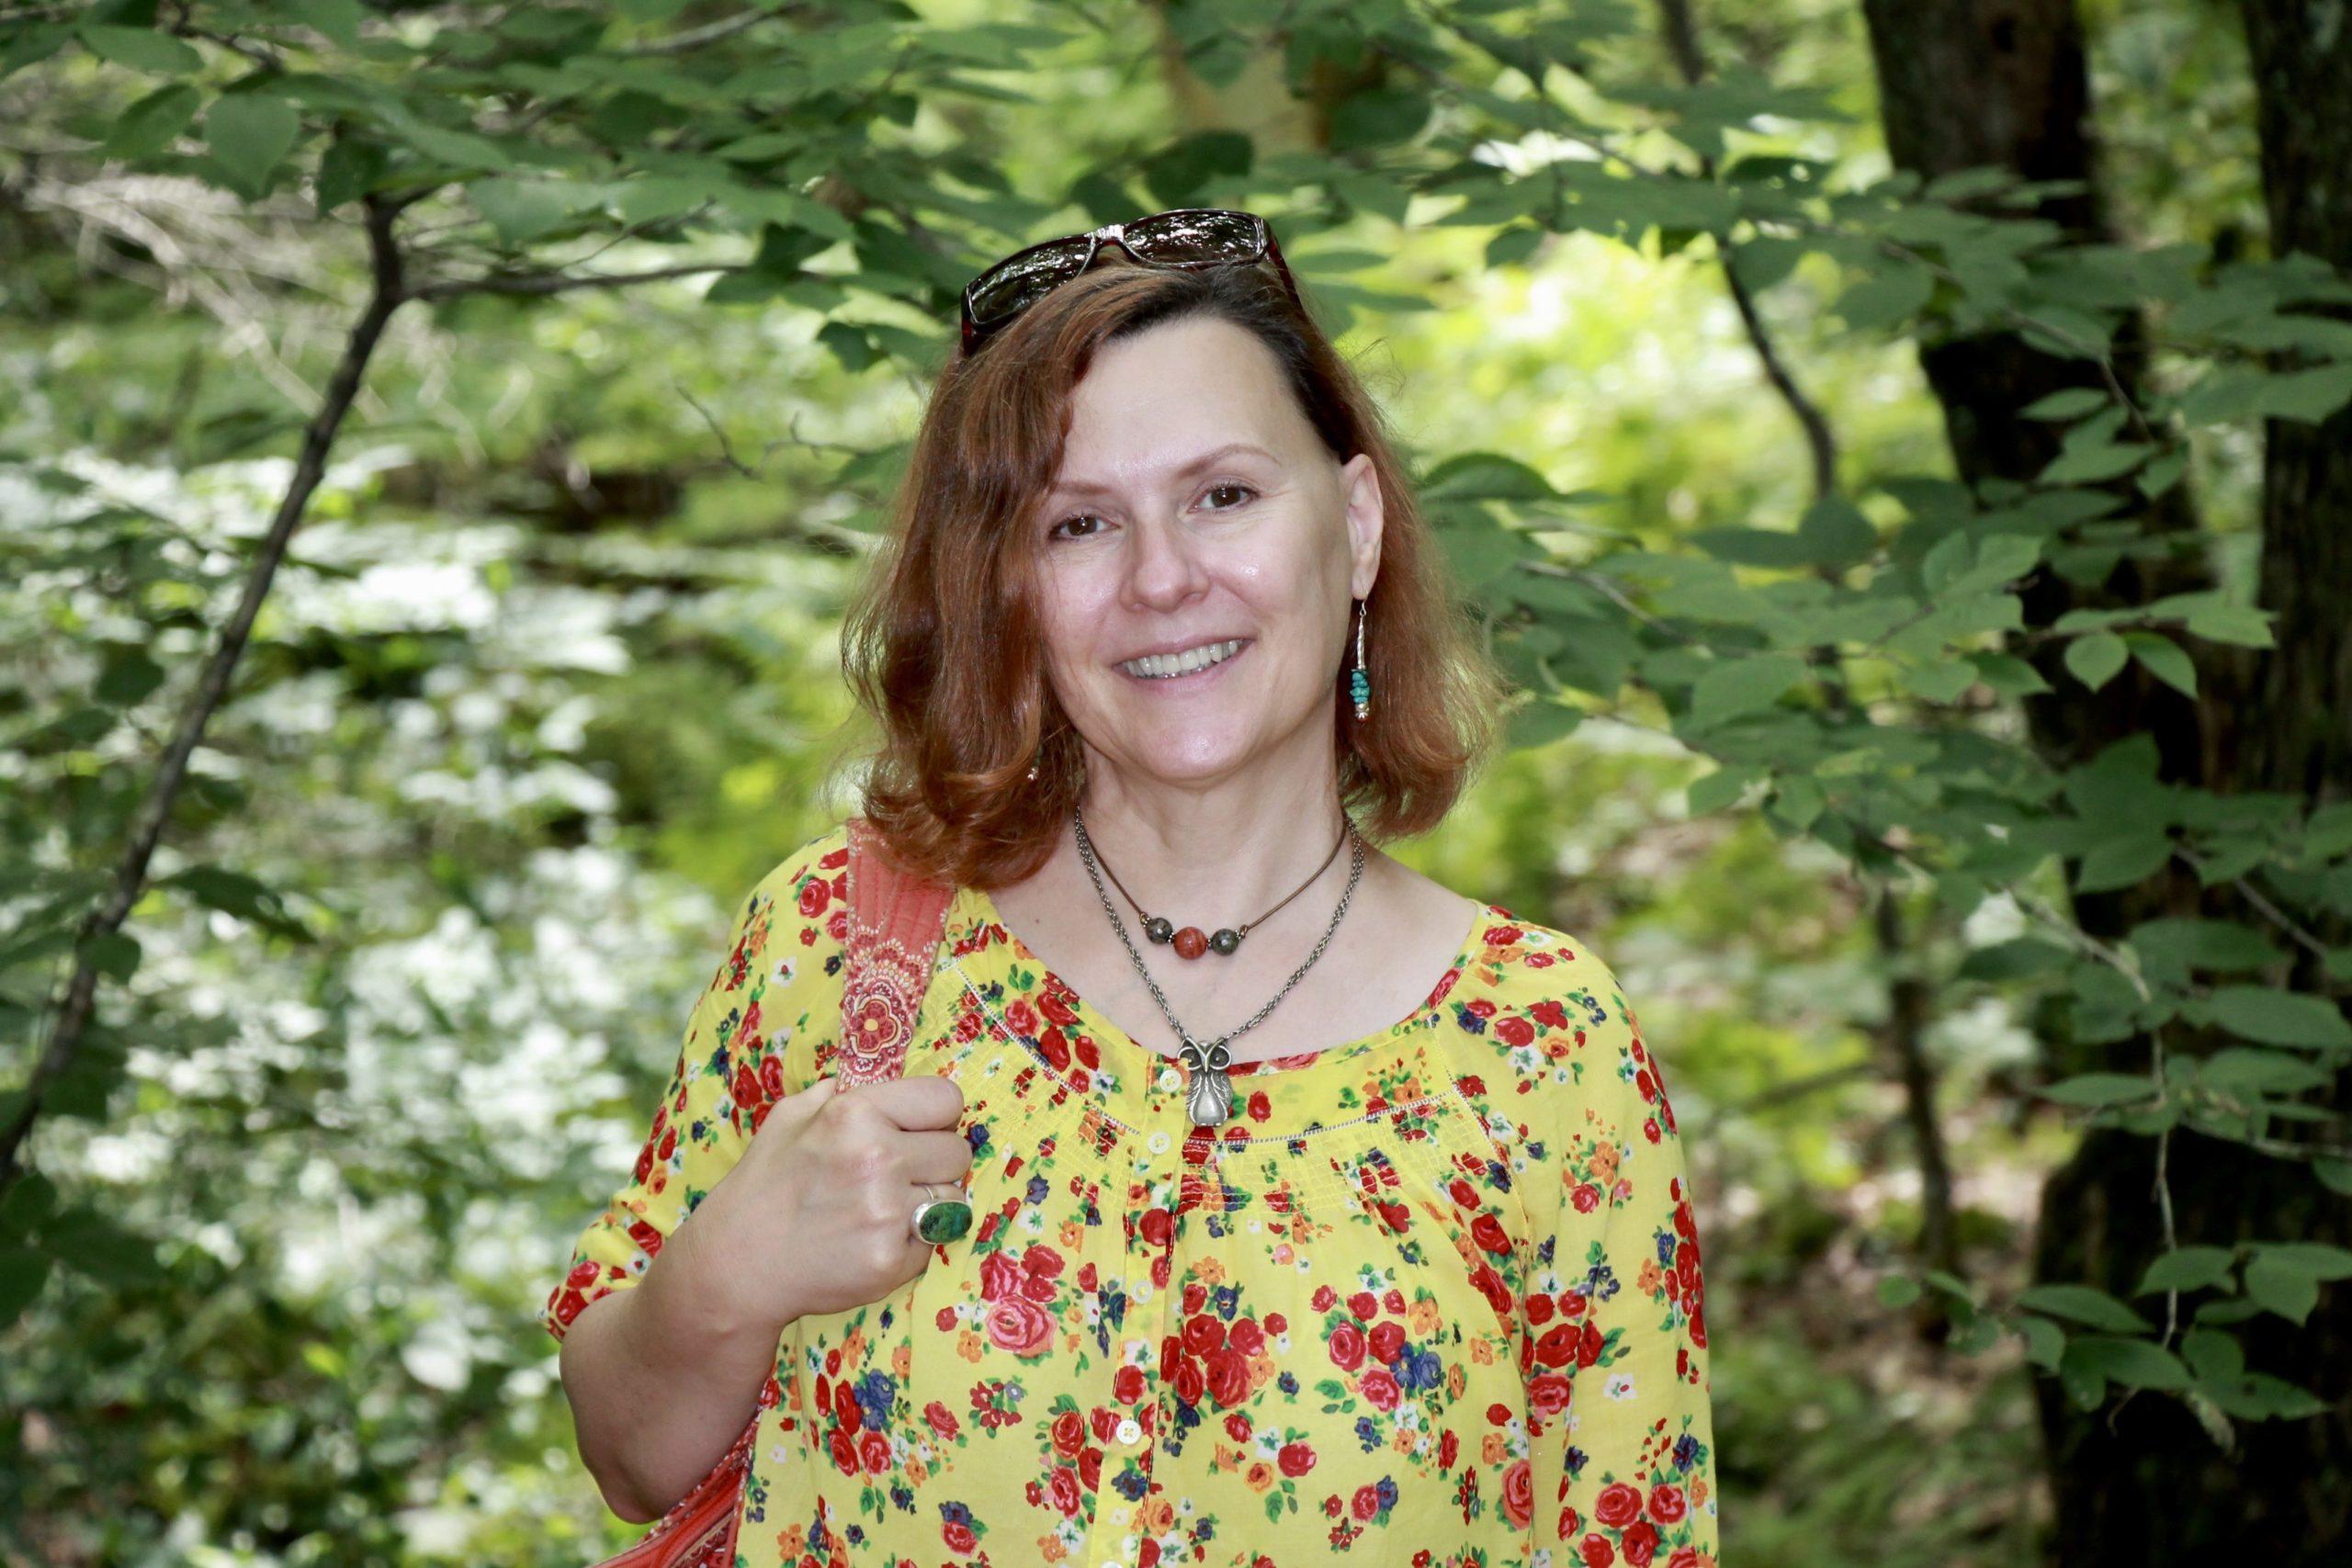 Rose Christie